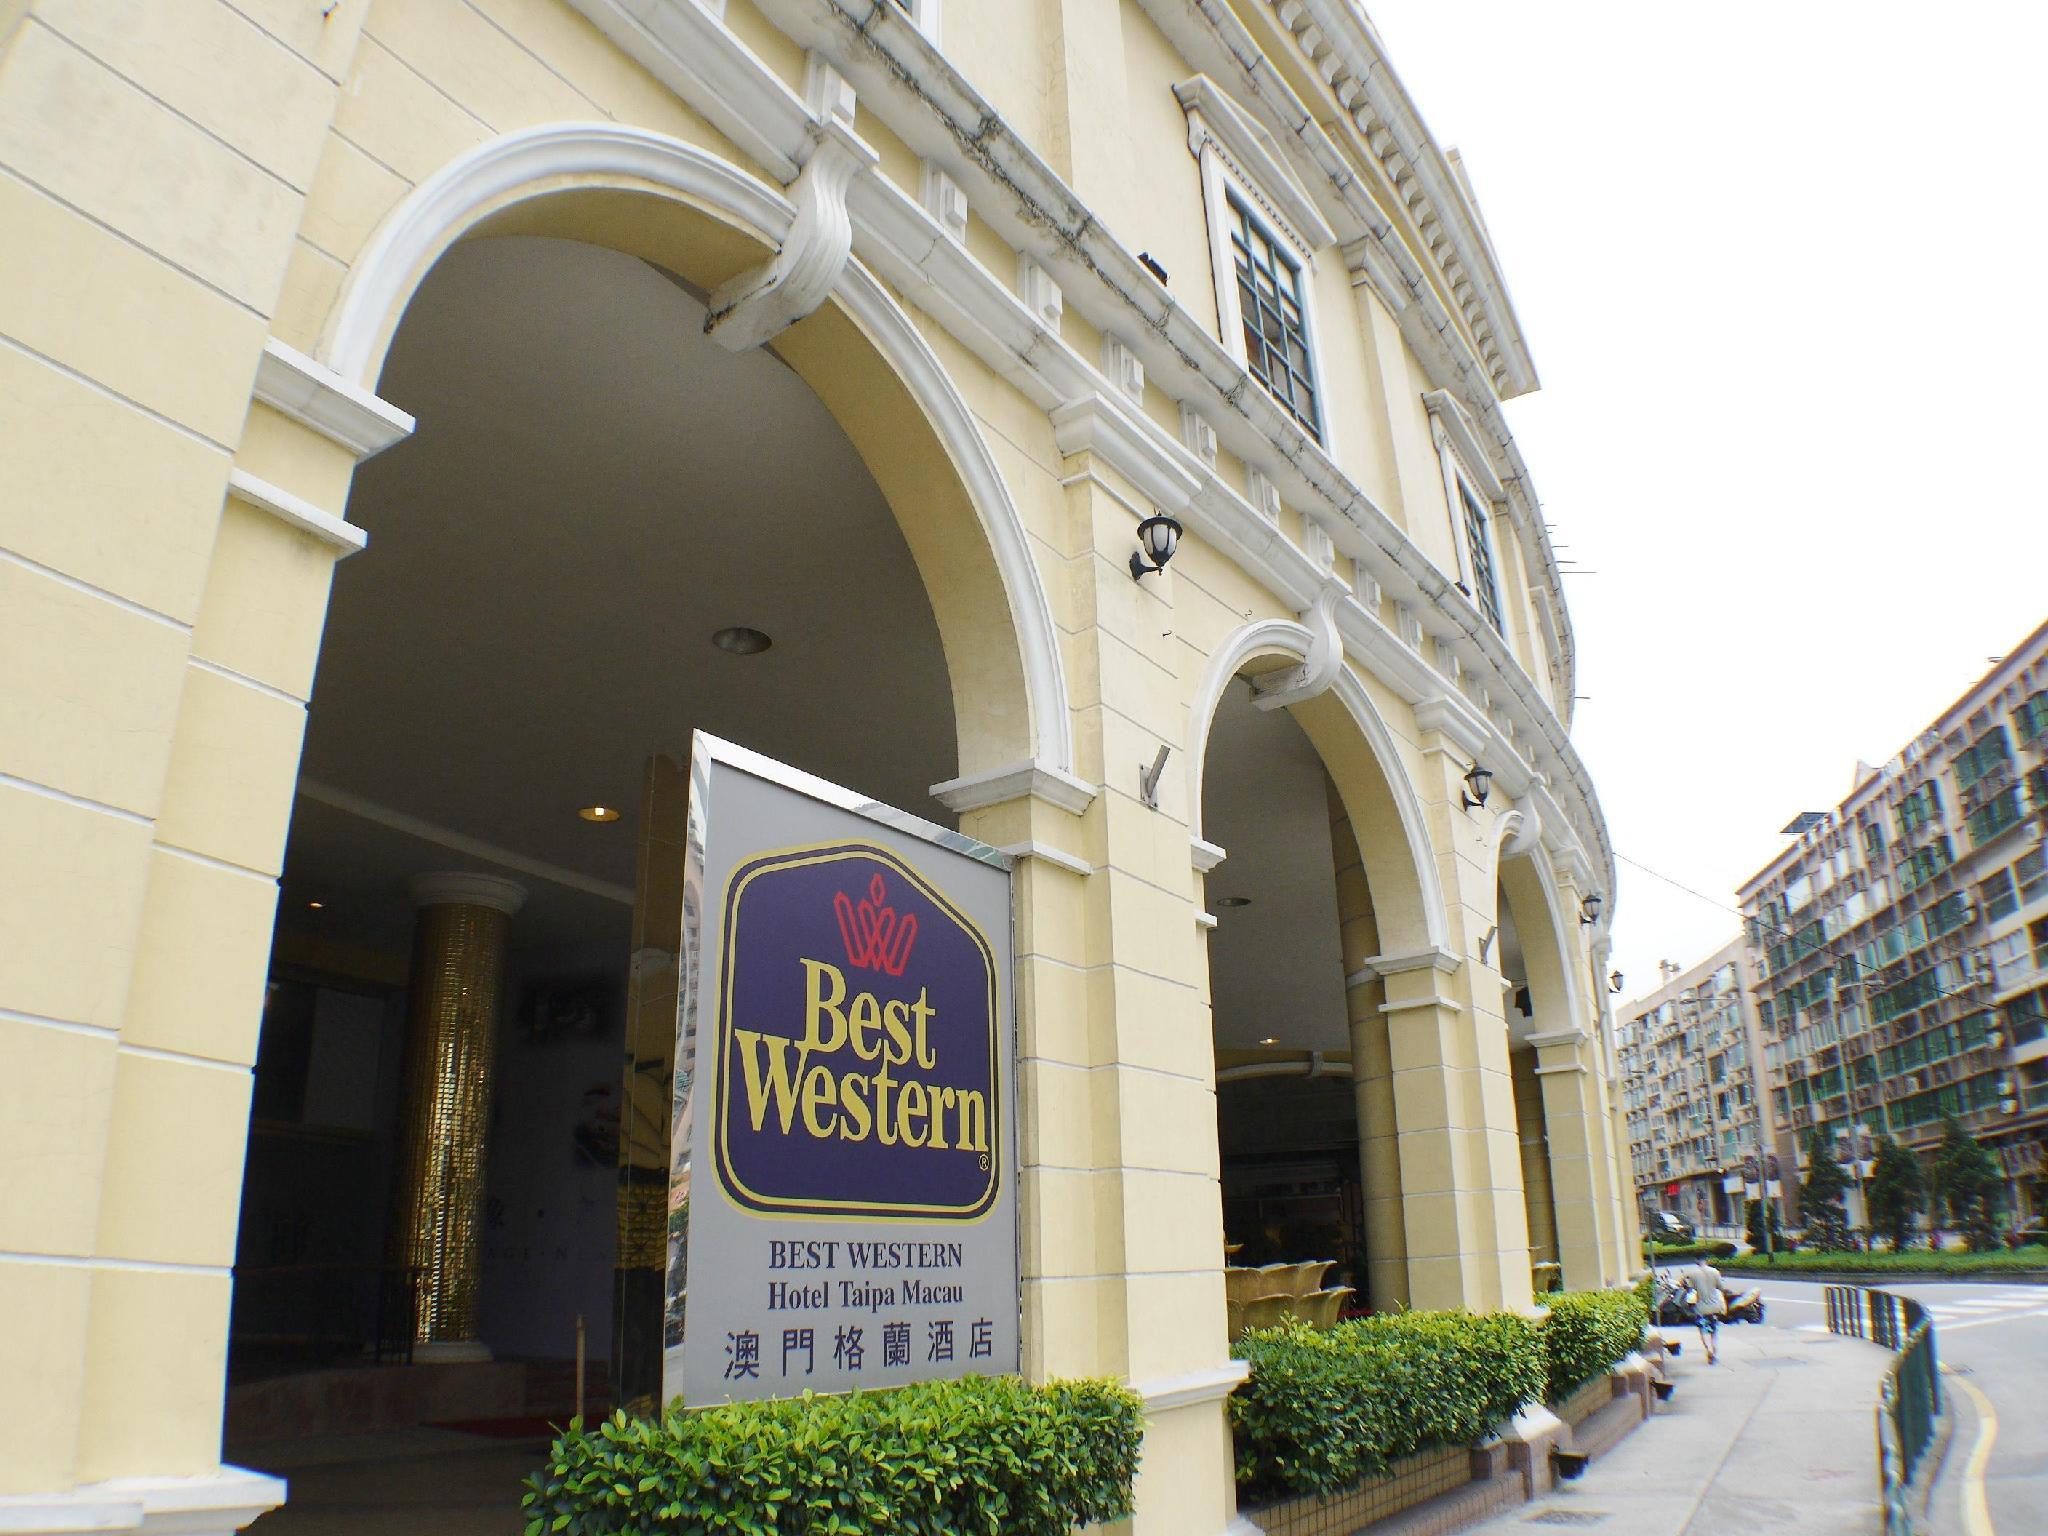 Best Western Hotel Taipa